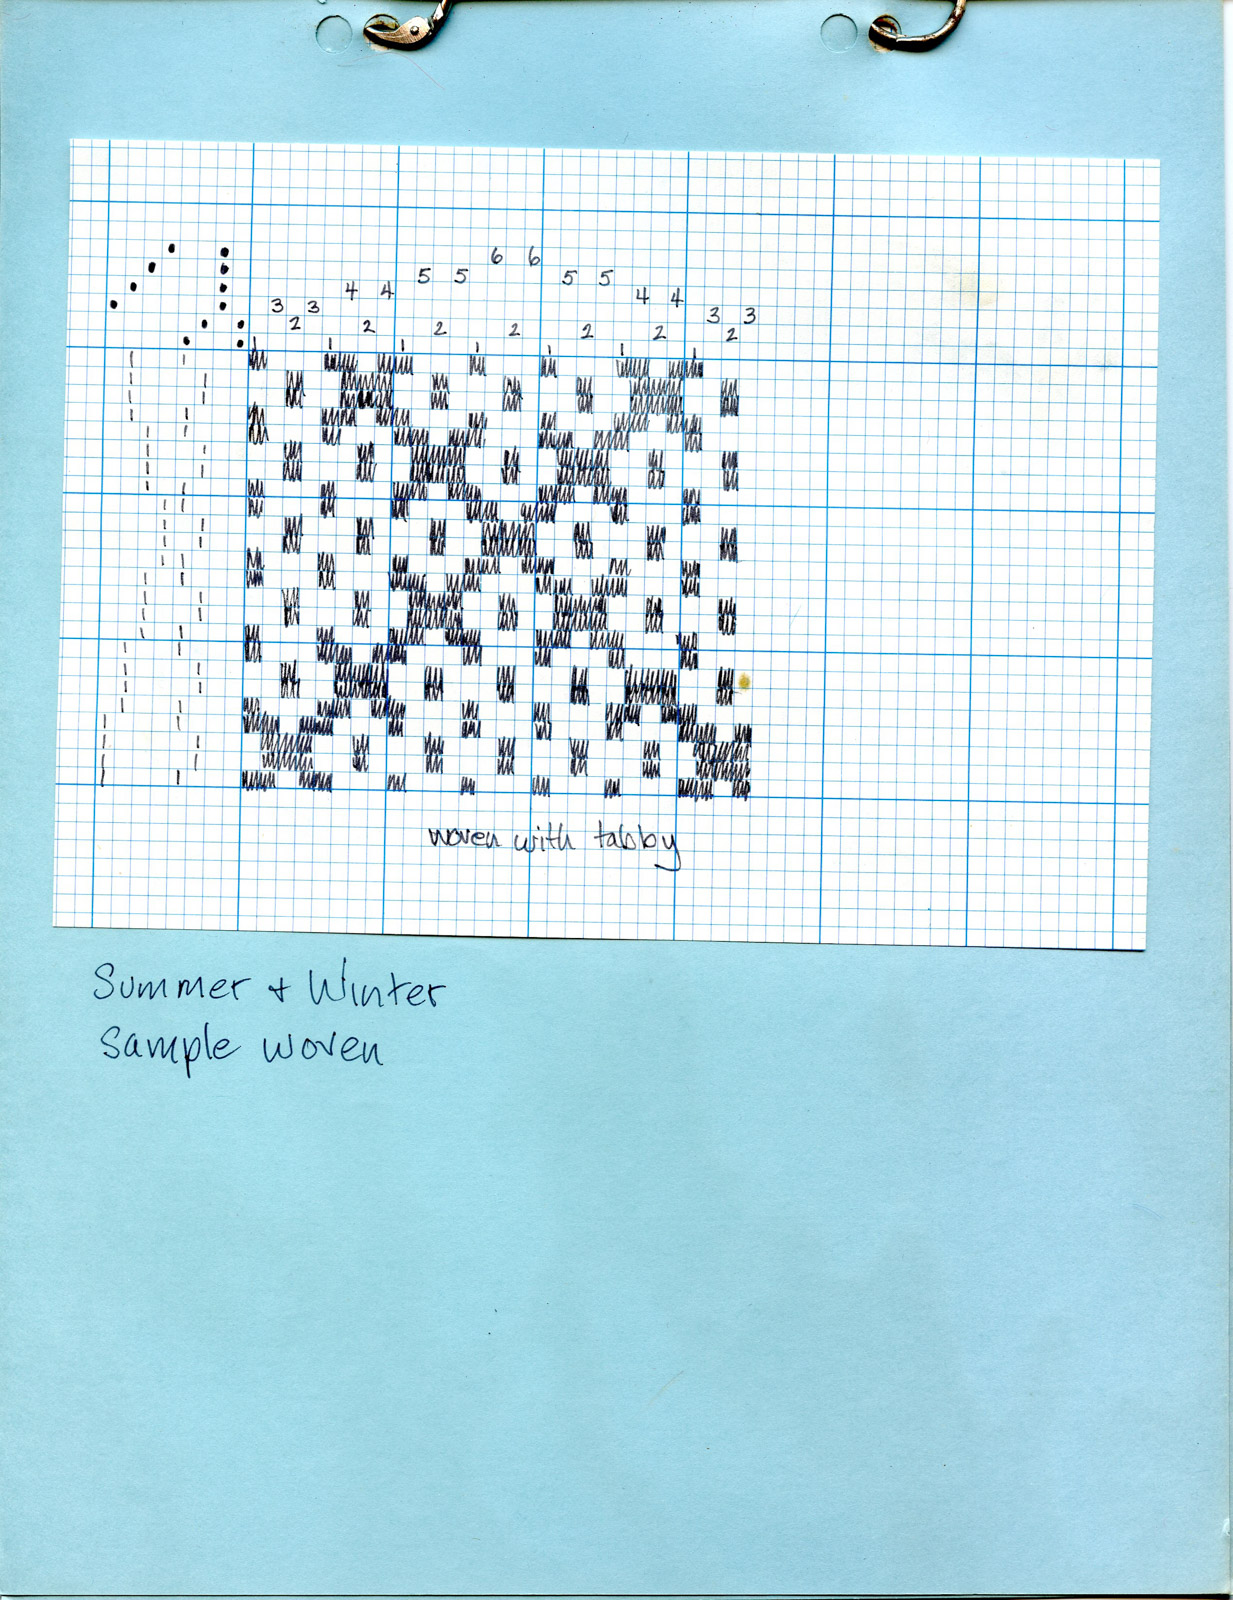 Profile Drafting – Summer & Winter